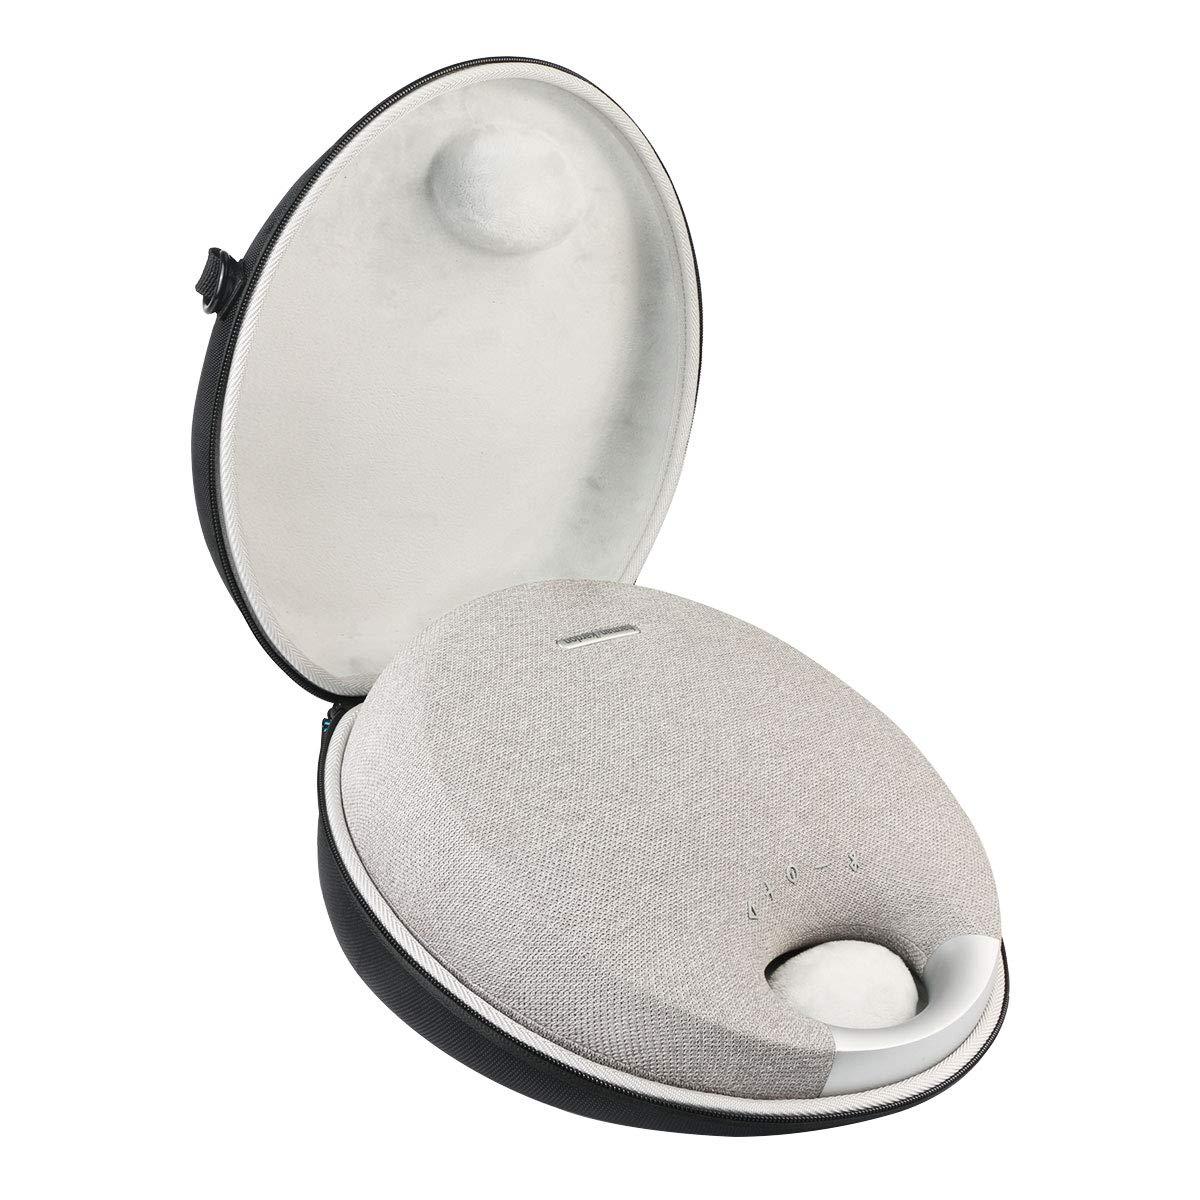 Khanka Hard Travel Case Replacement for Harman Kardon Onyx Studio 5/6 Bluetooth Wireless Speaker by khanka